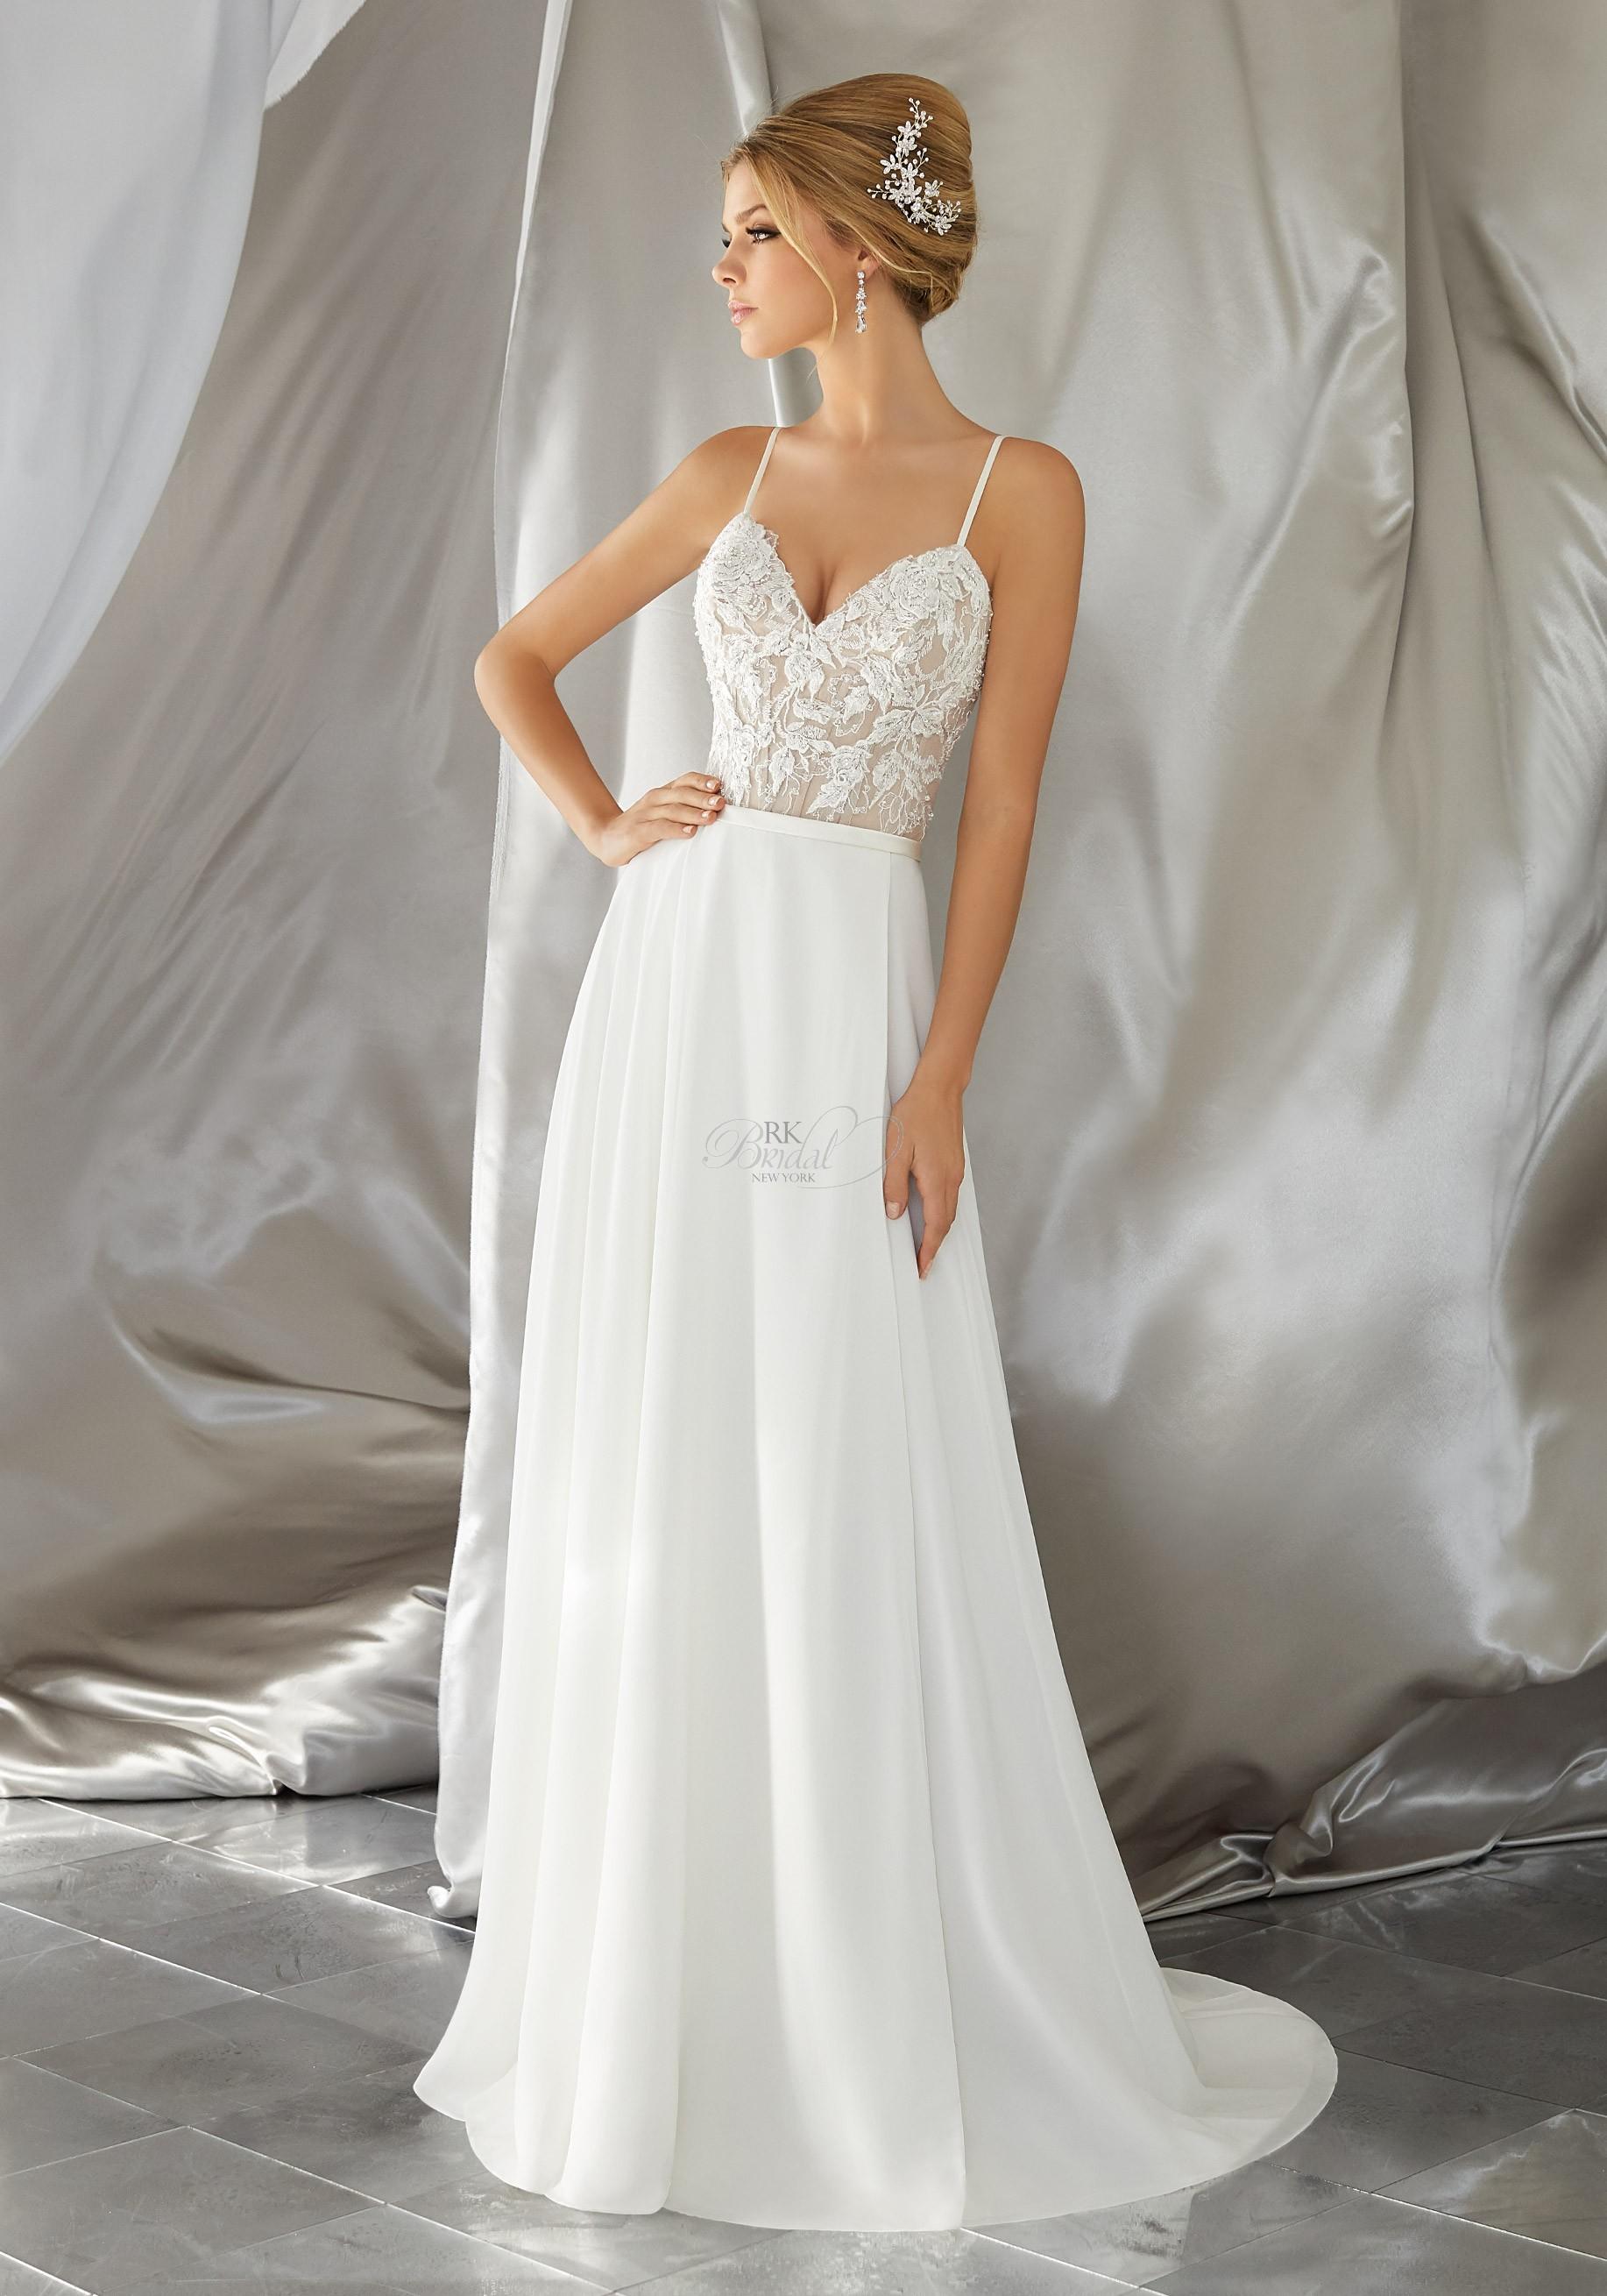 6861-1-2-rk-bridal